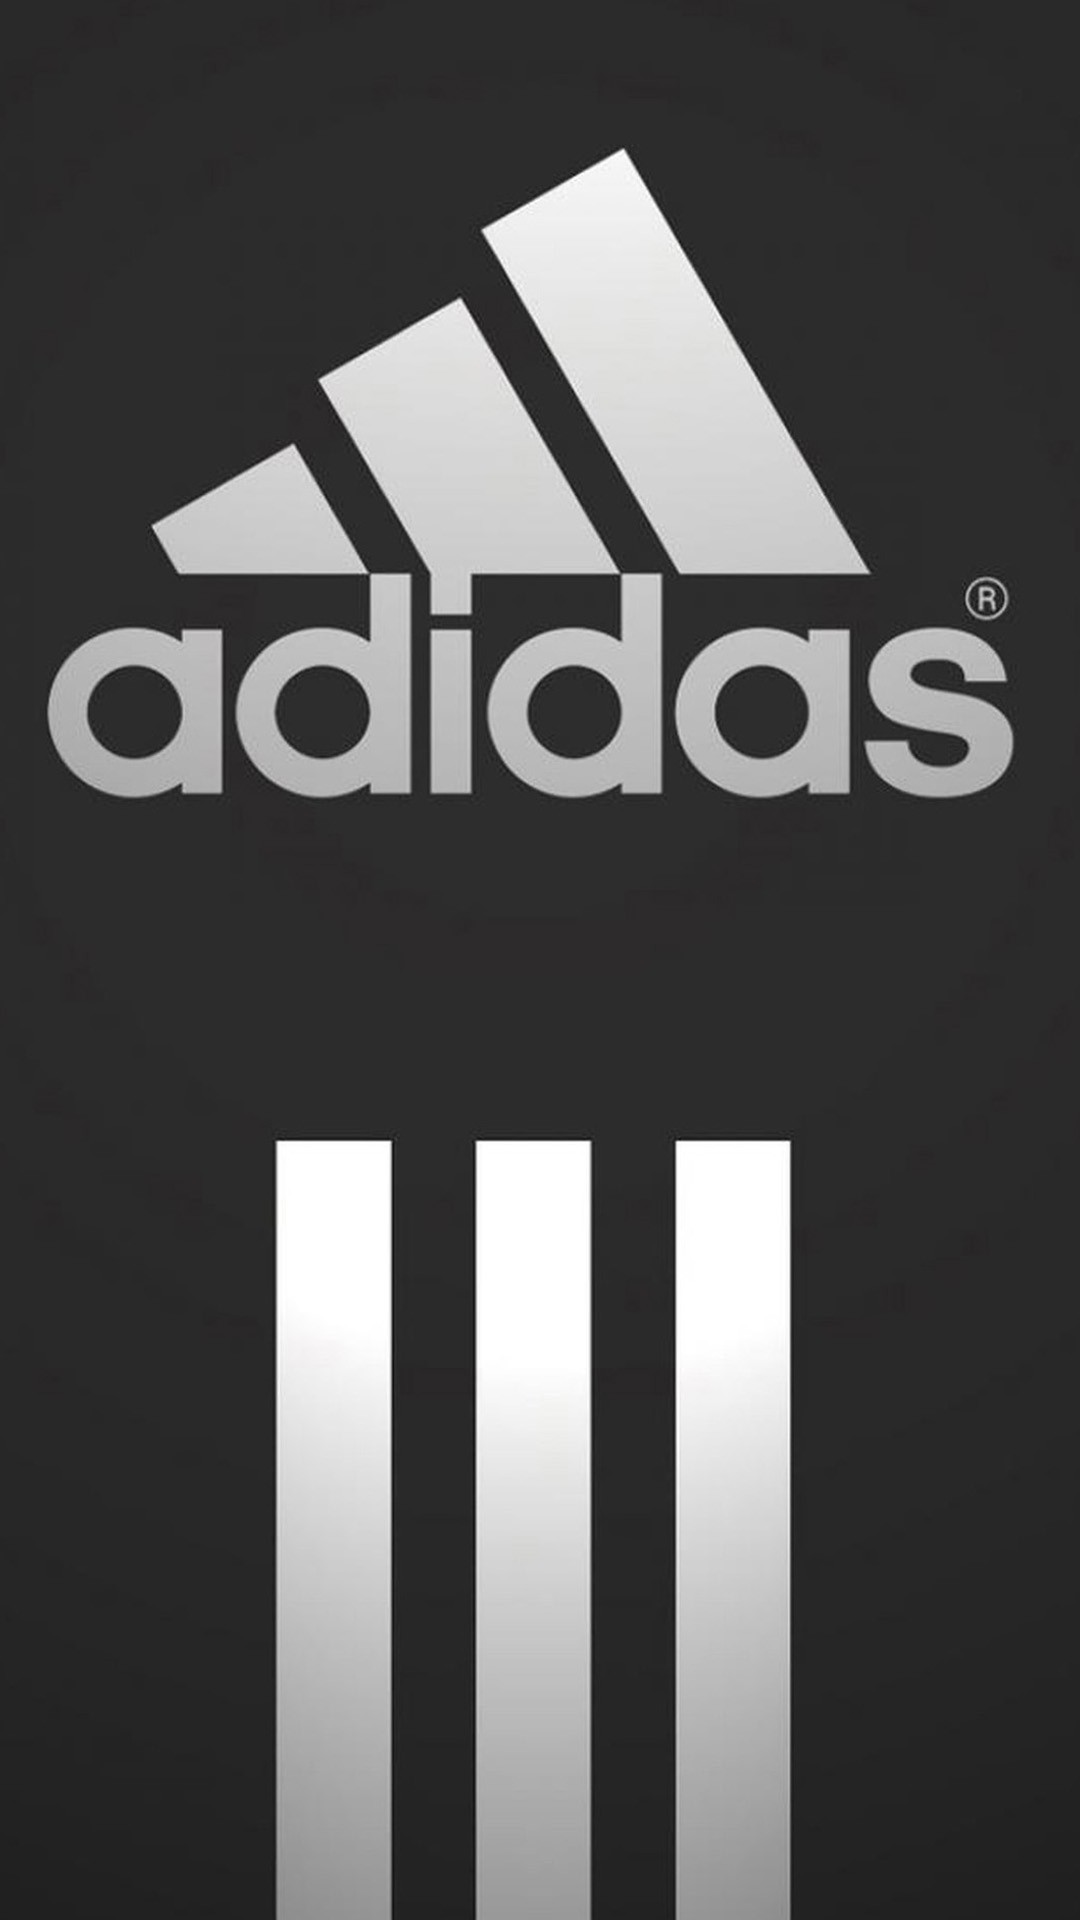 Black Adidas iPhone 6 wallpaper